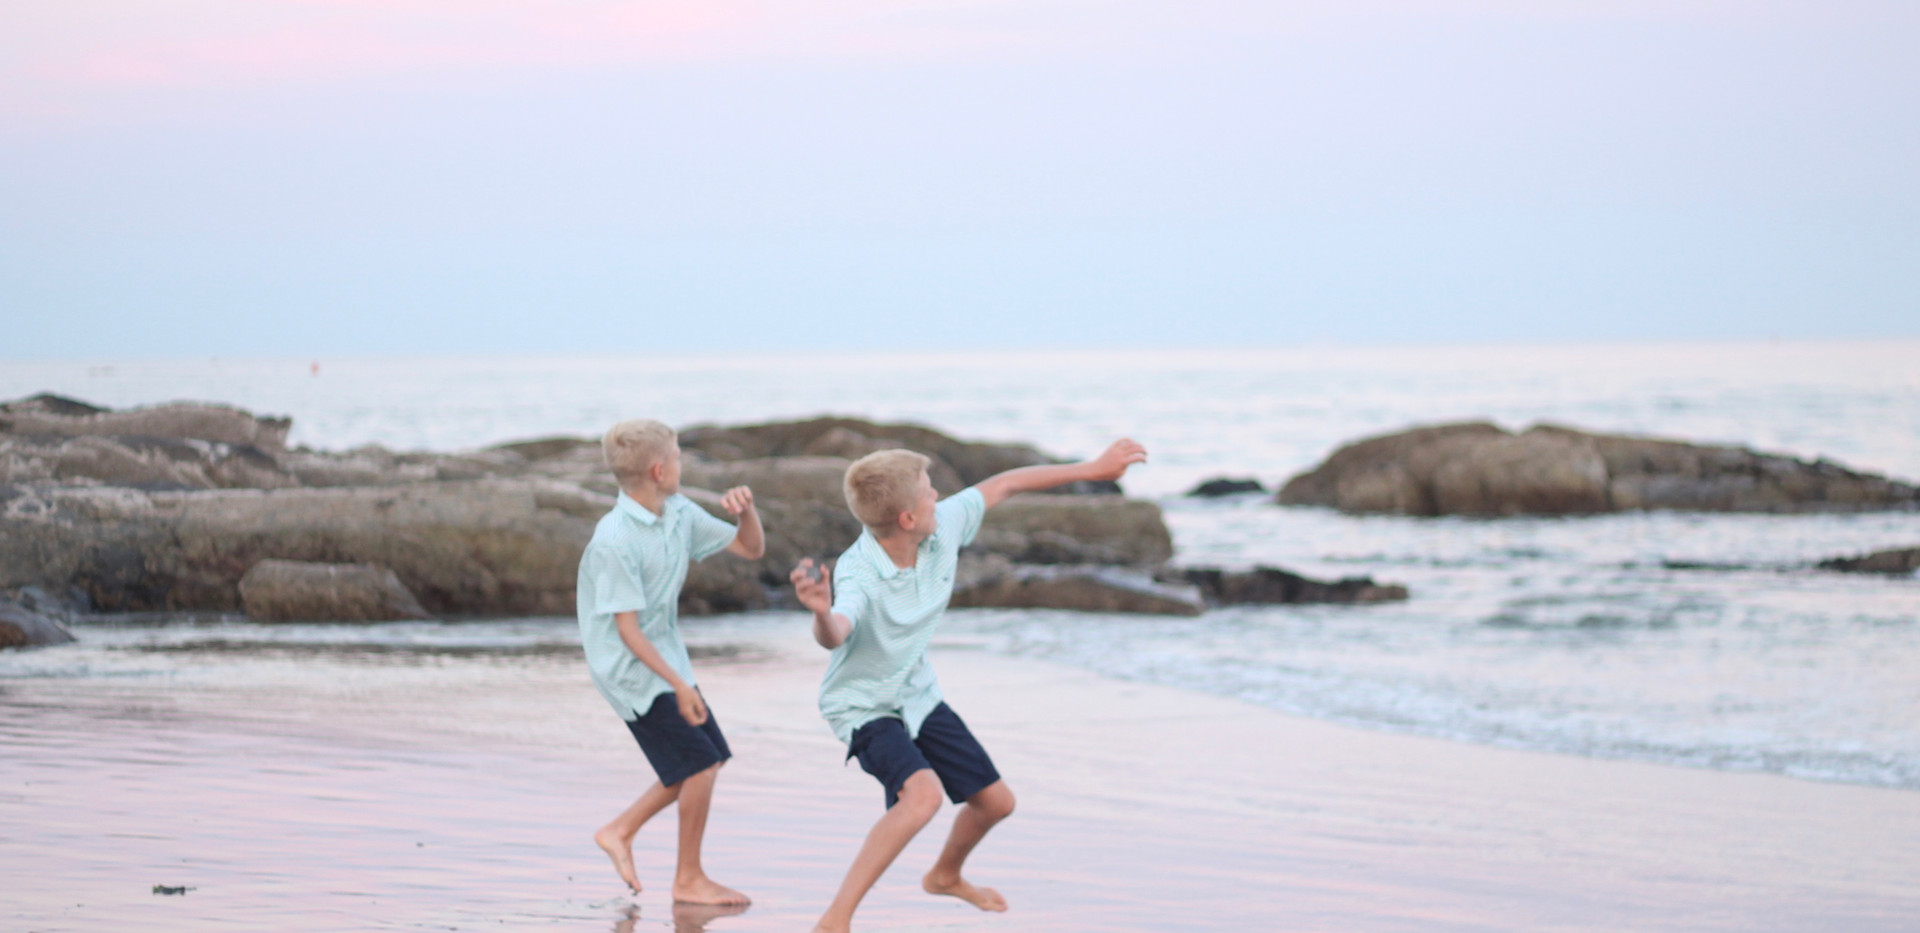 boys throwing rocks at beach, Chattanooga family photos